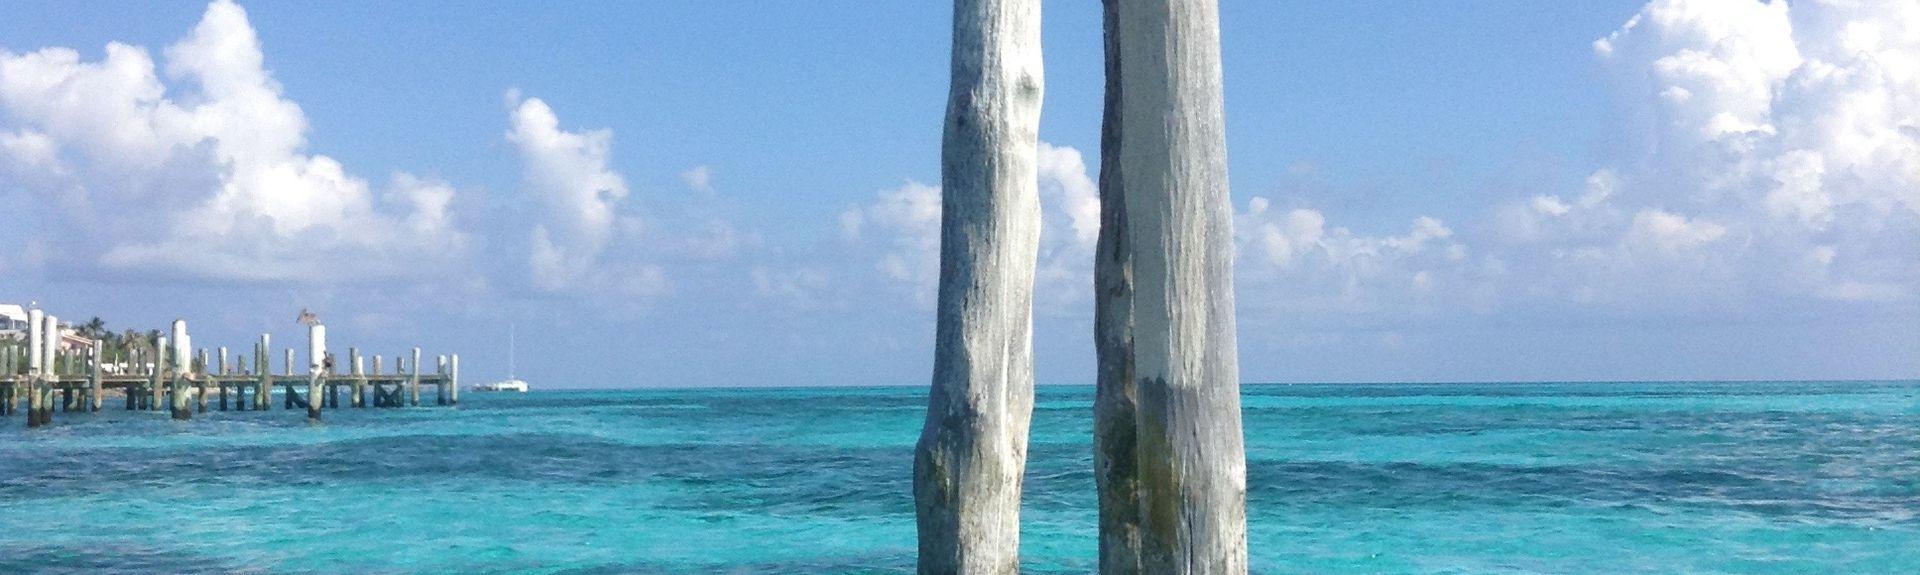 Isla Blanca, Quintana Roo, Mexico